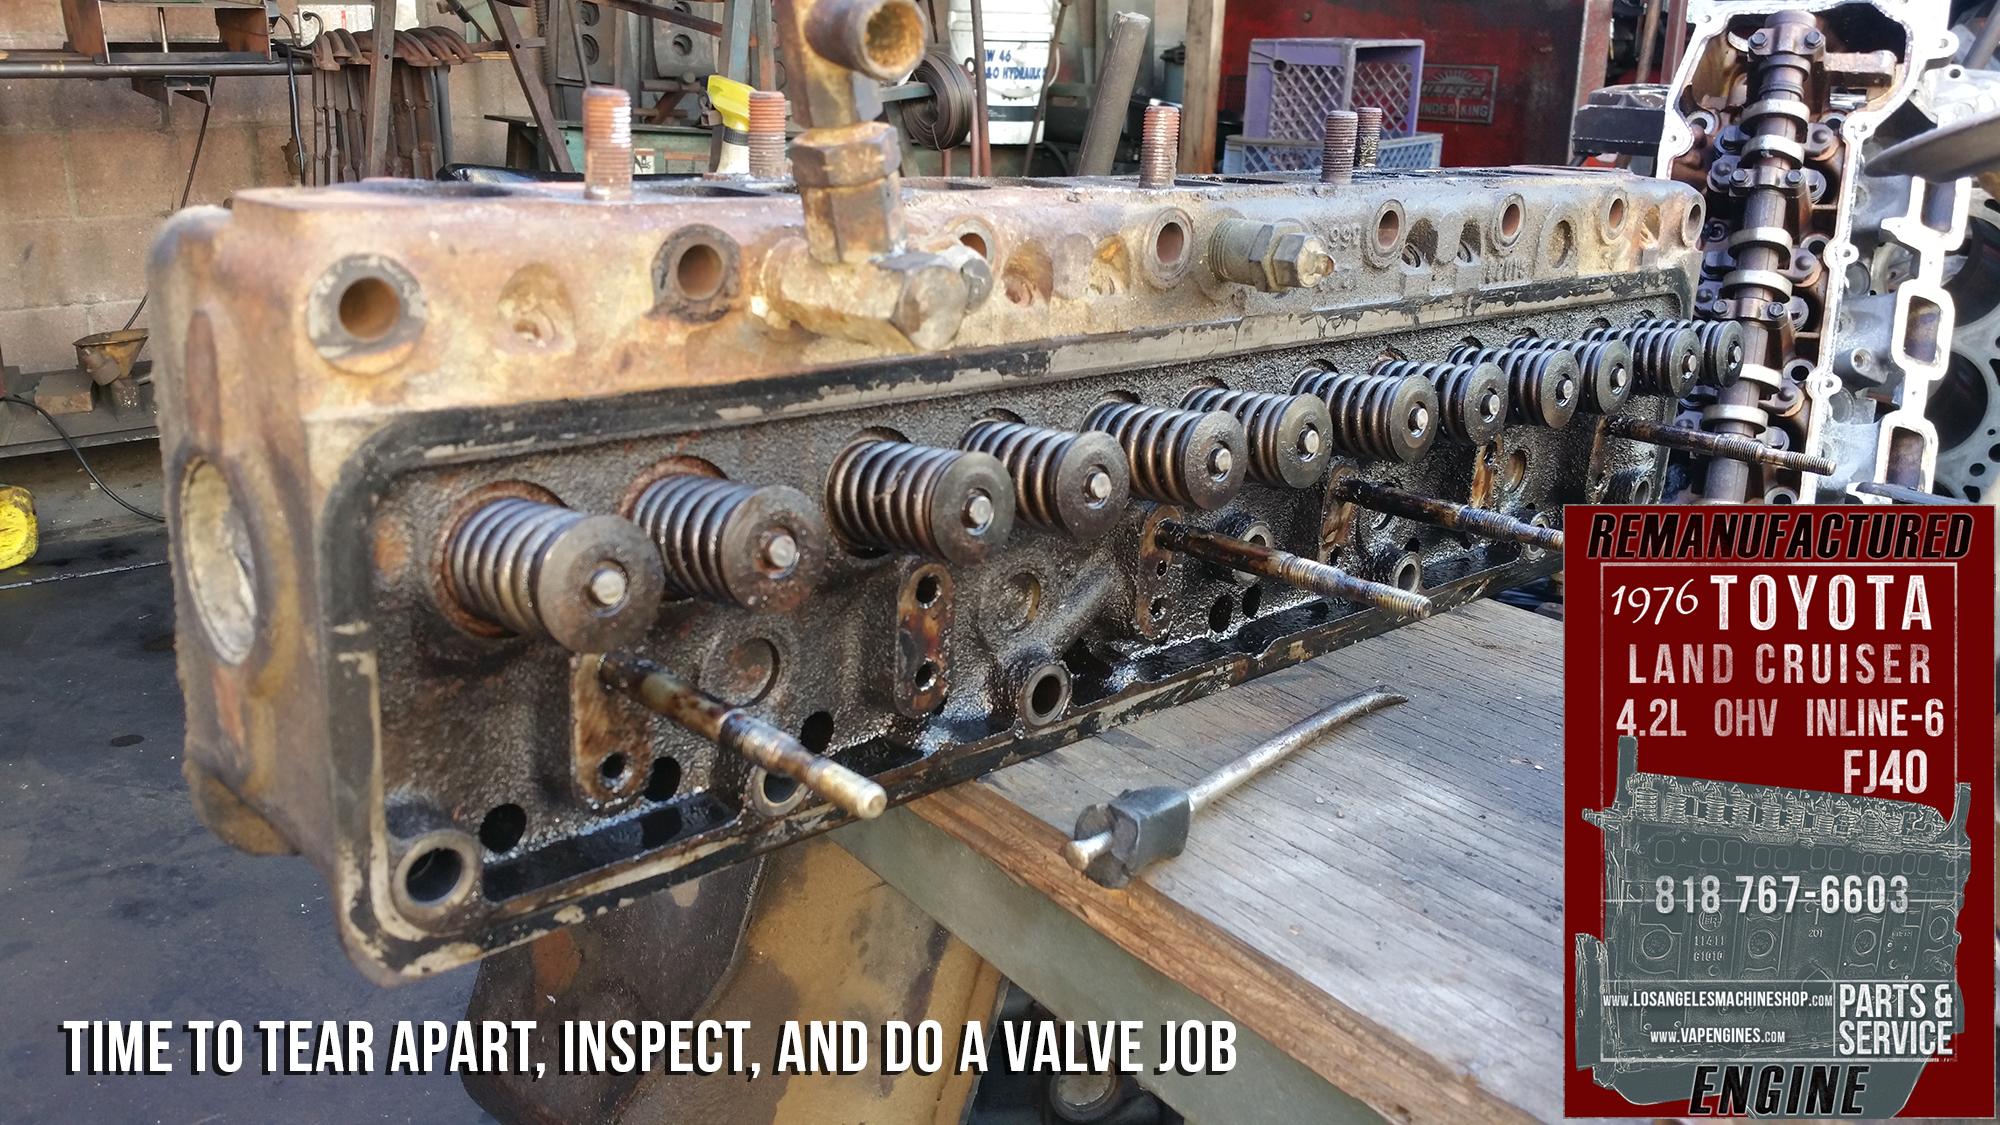 Subaru Machine Shop Los Angeles >> Ford 4 Cylinder Remanufactured Engines.html   Autos Post